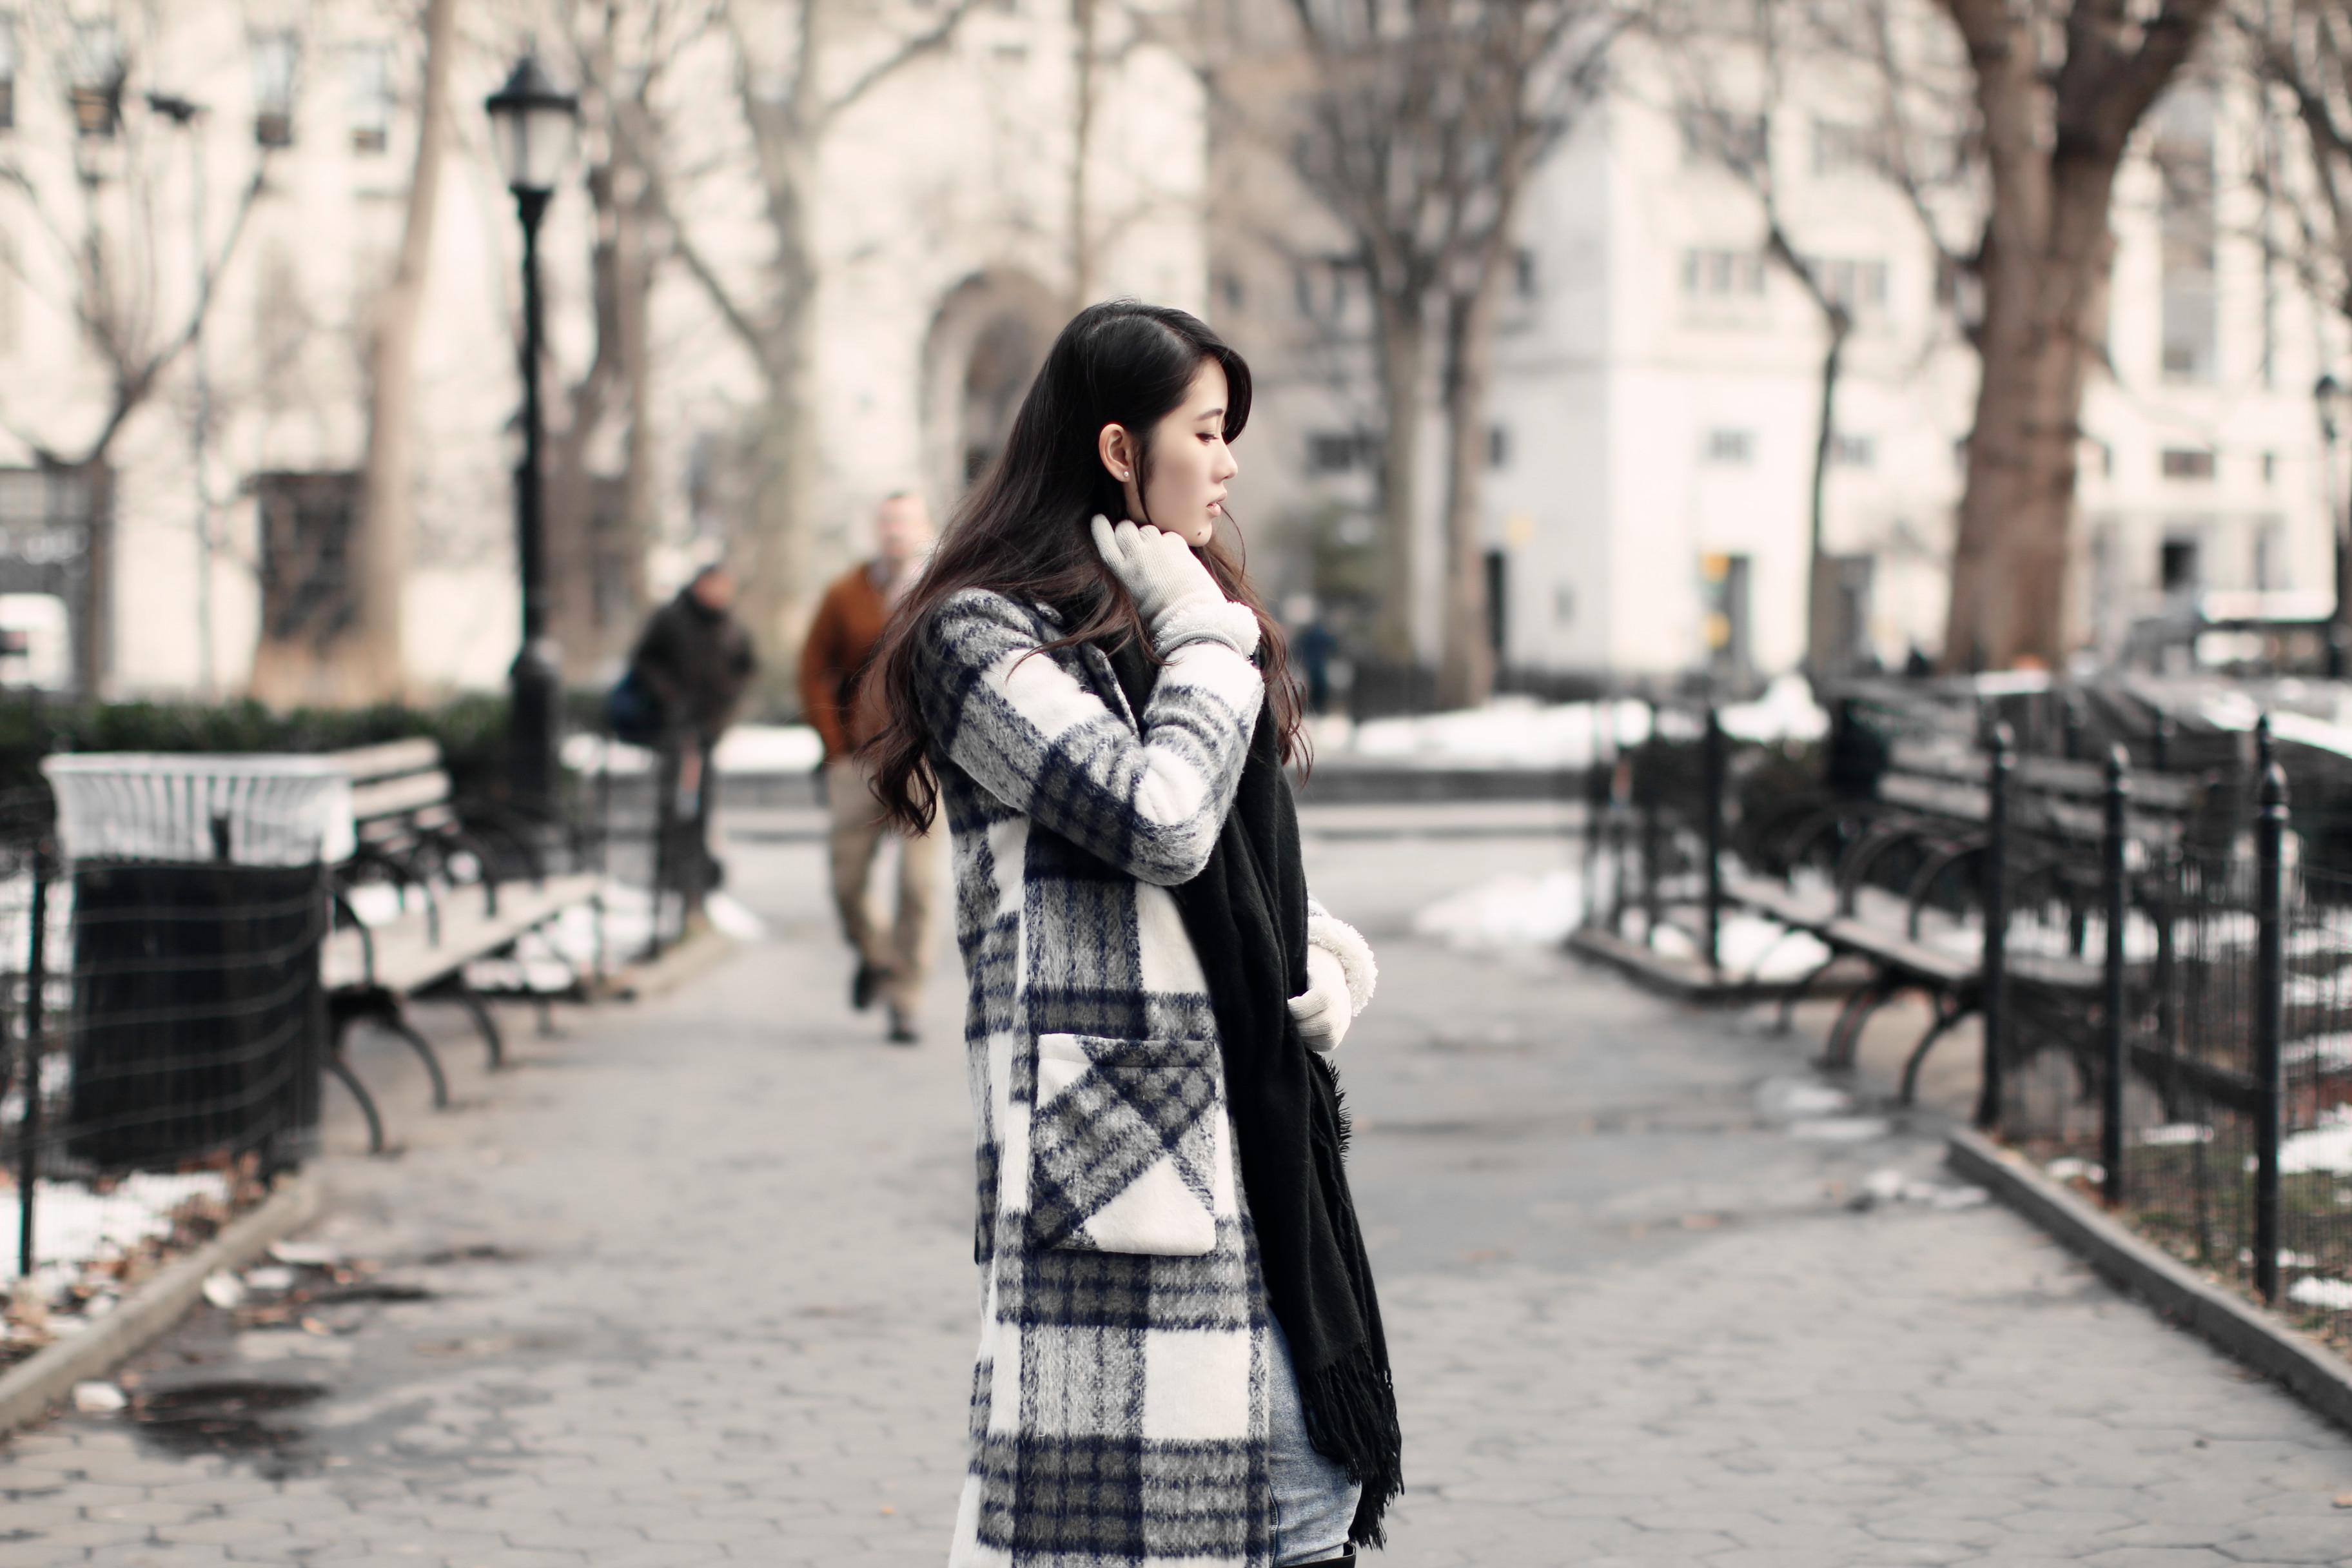 2084-clothestoyouuu-elizabeeetht-nyfw-newyorkfashionweek-nyc-fashionweek-newyork- winter2017-fashion-ootd